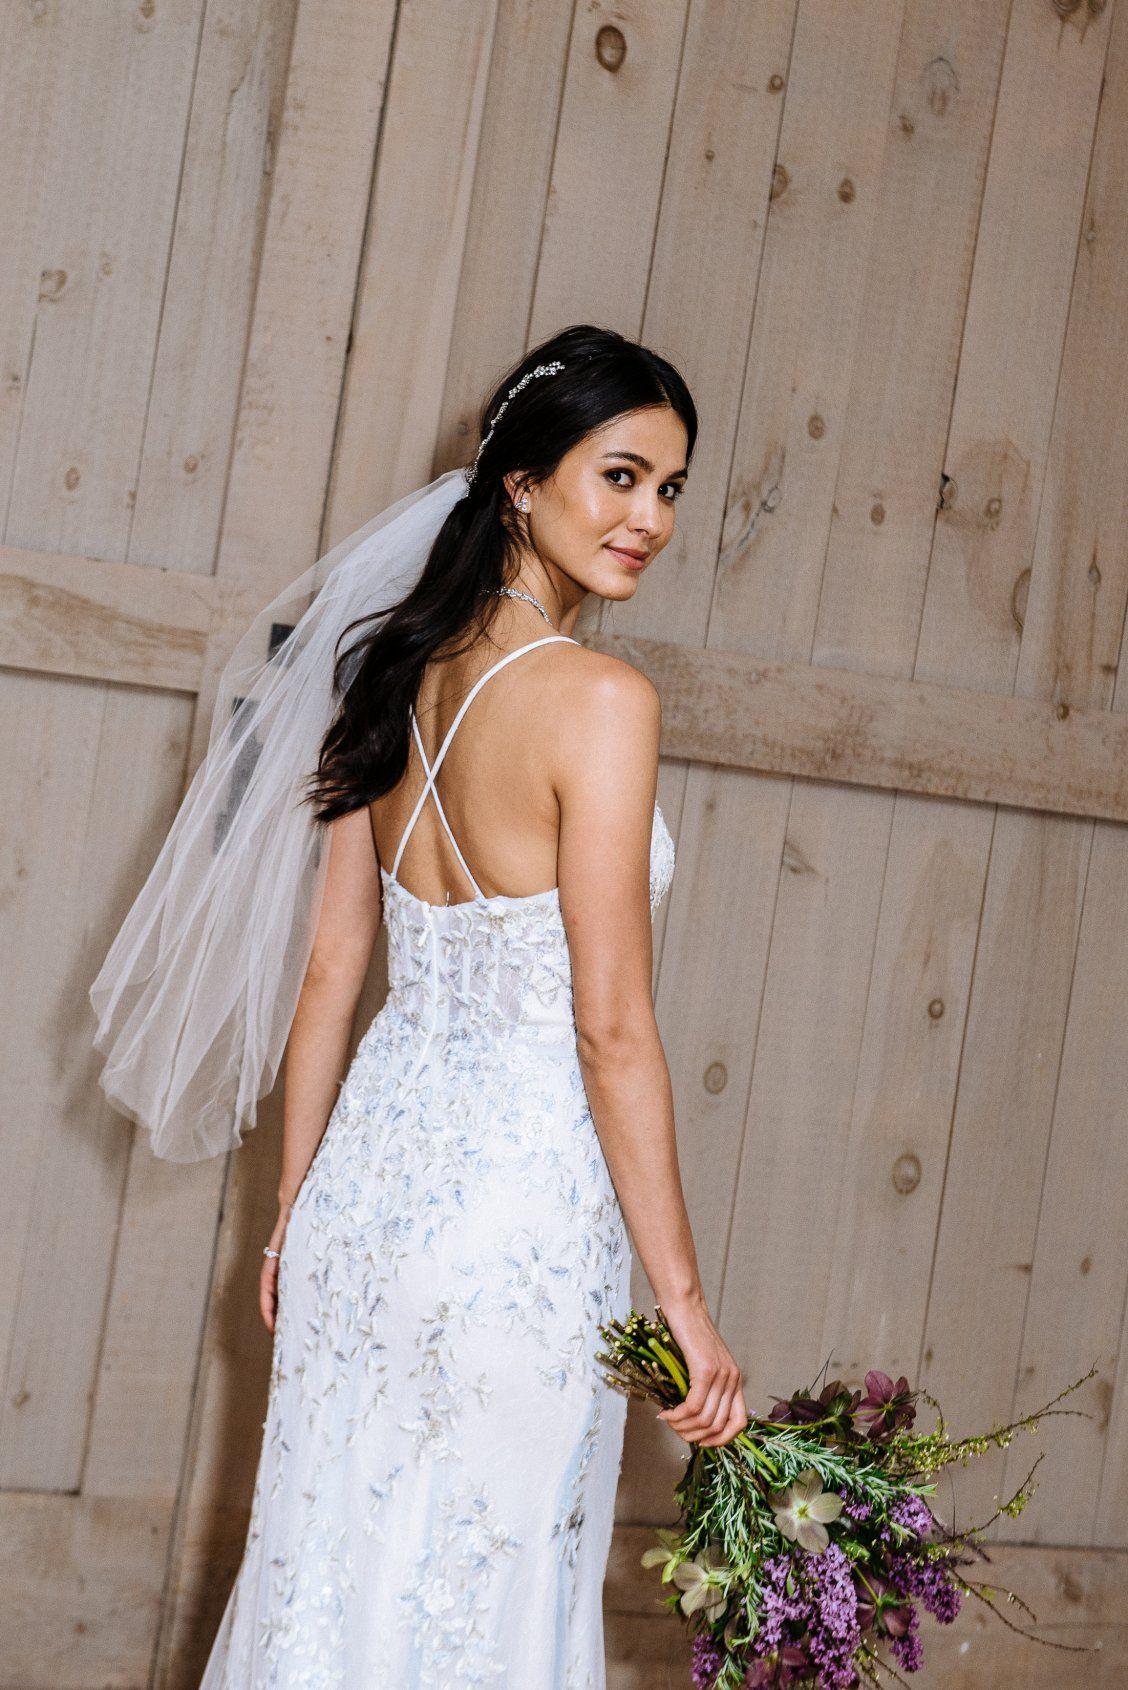 3823096404a0b Melissa Sweet Spaghetti Strap Ivory/Cloud Blue Sheath Wedding Dress  available at David's Bridal